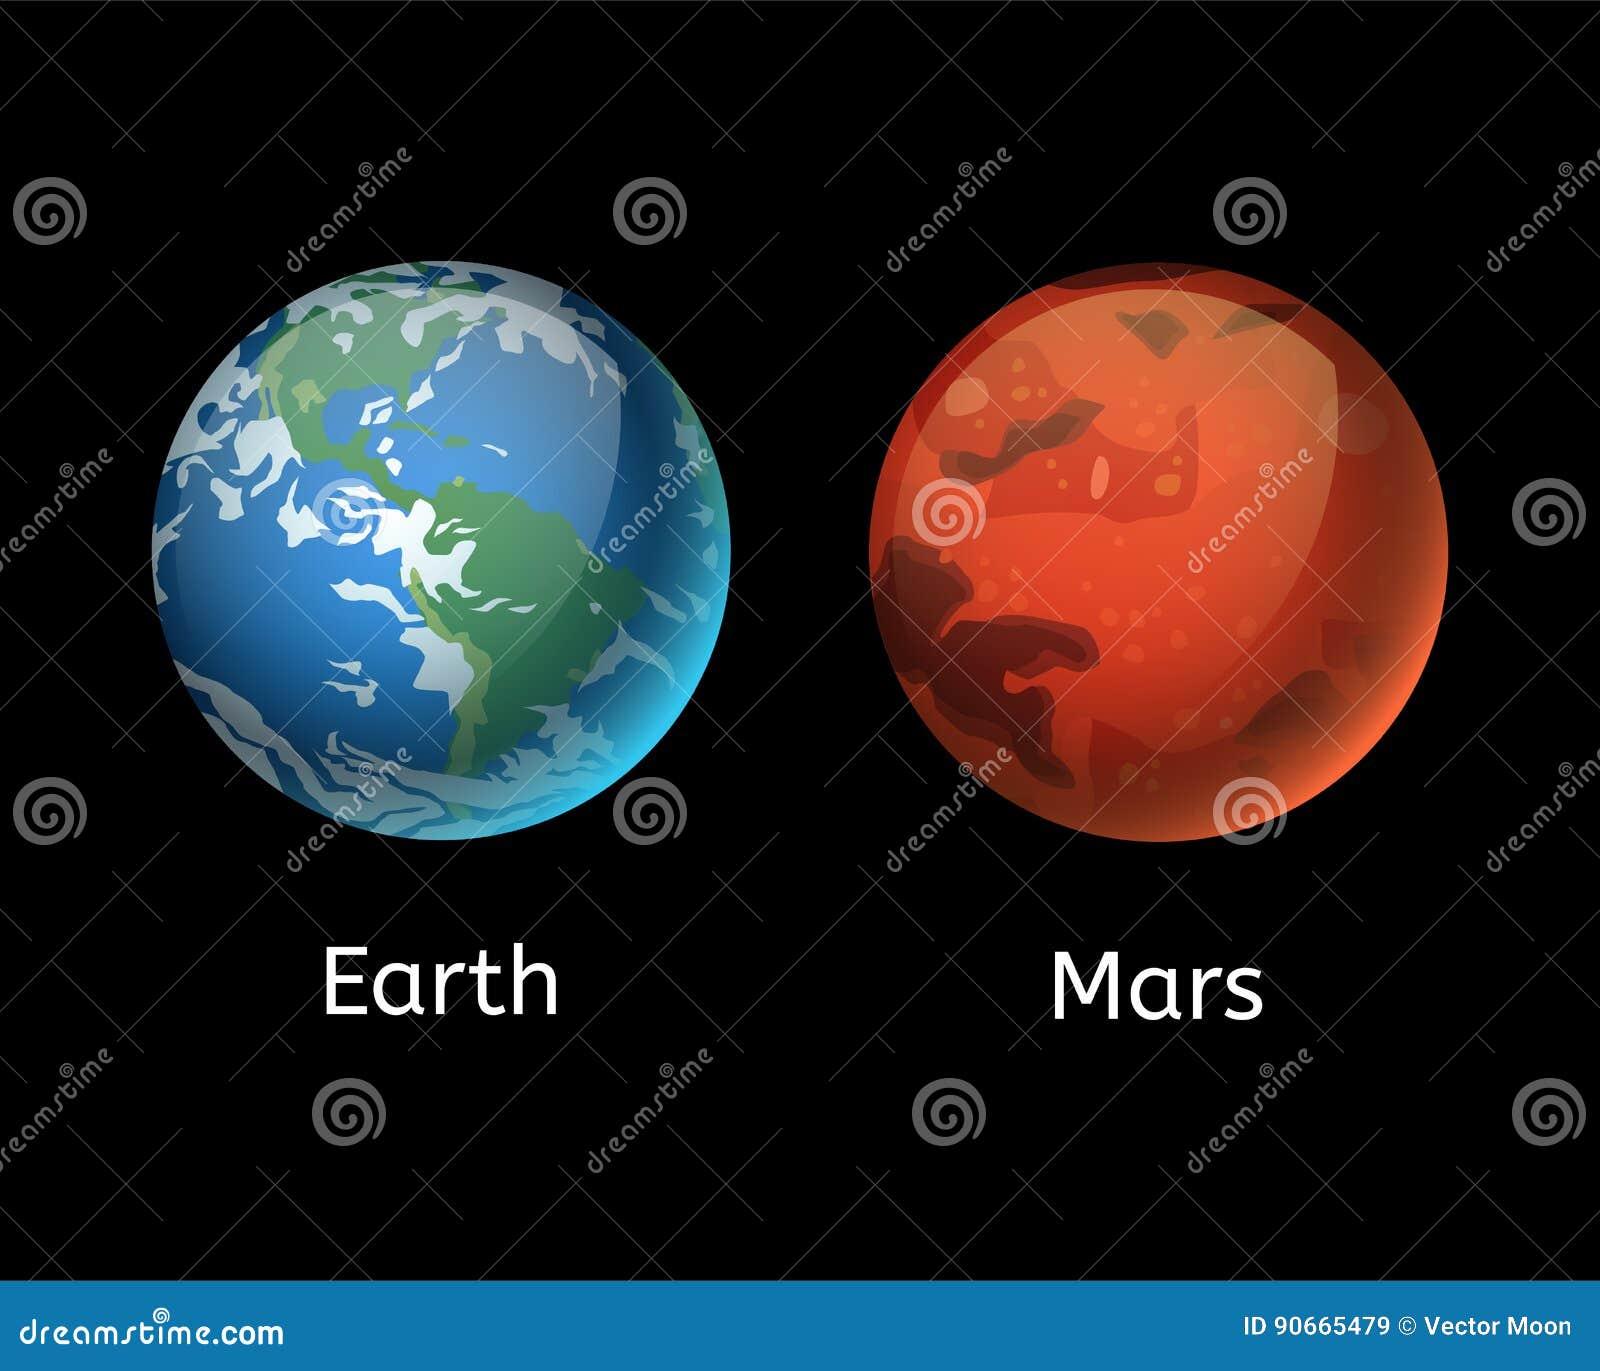 Orbit Science